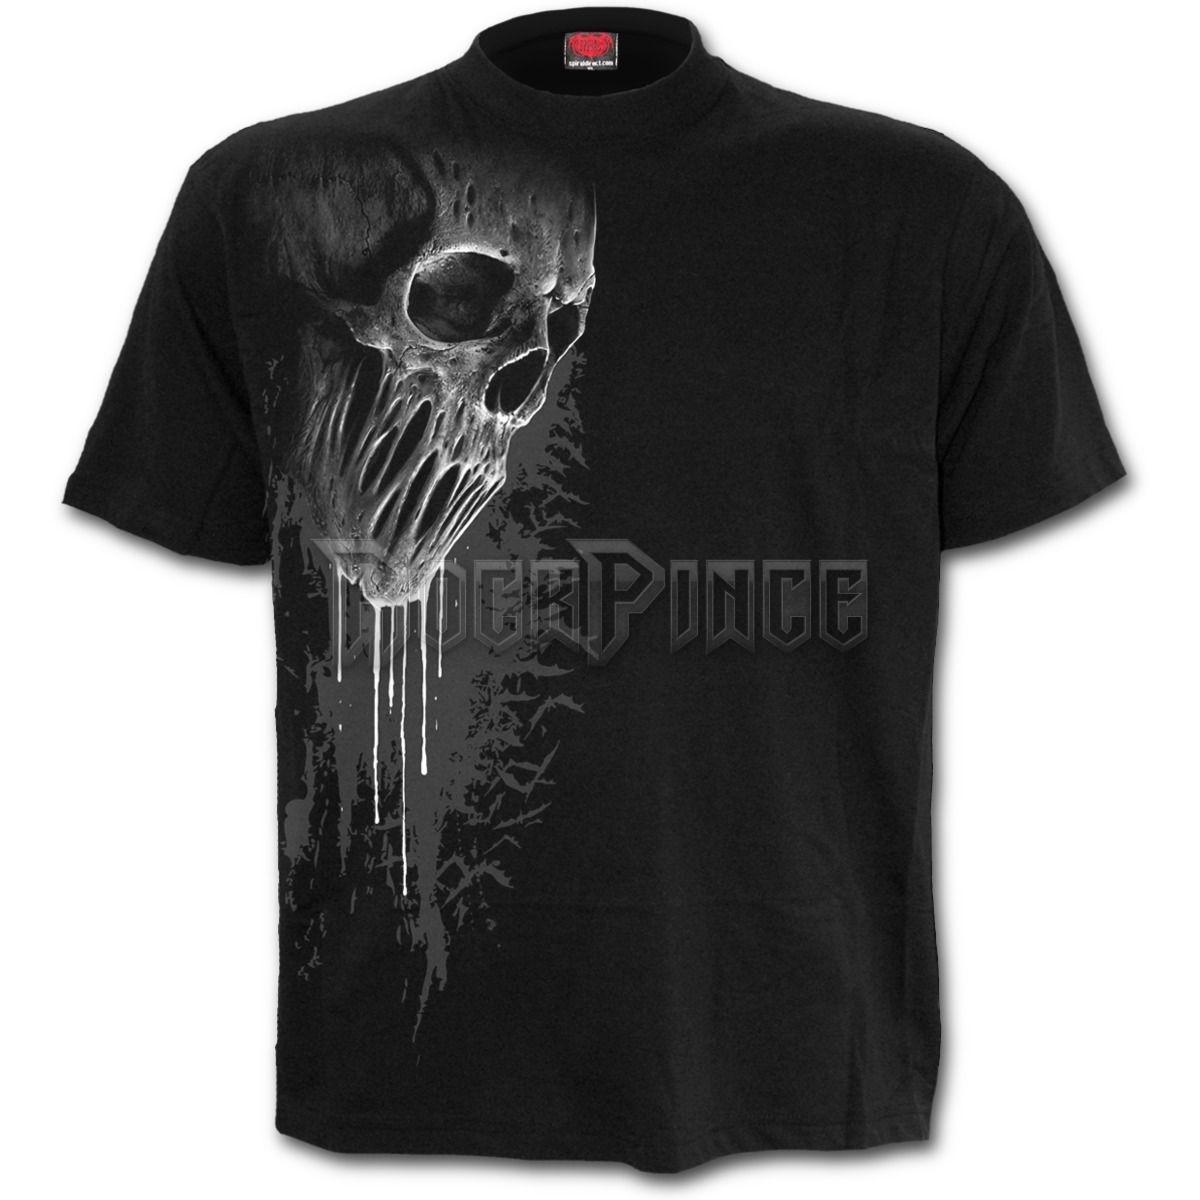 BAT CURSE - Front Print T-Shirt Black - E026M121